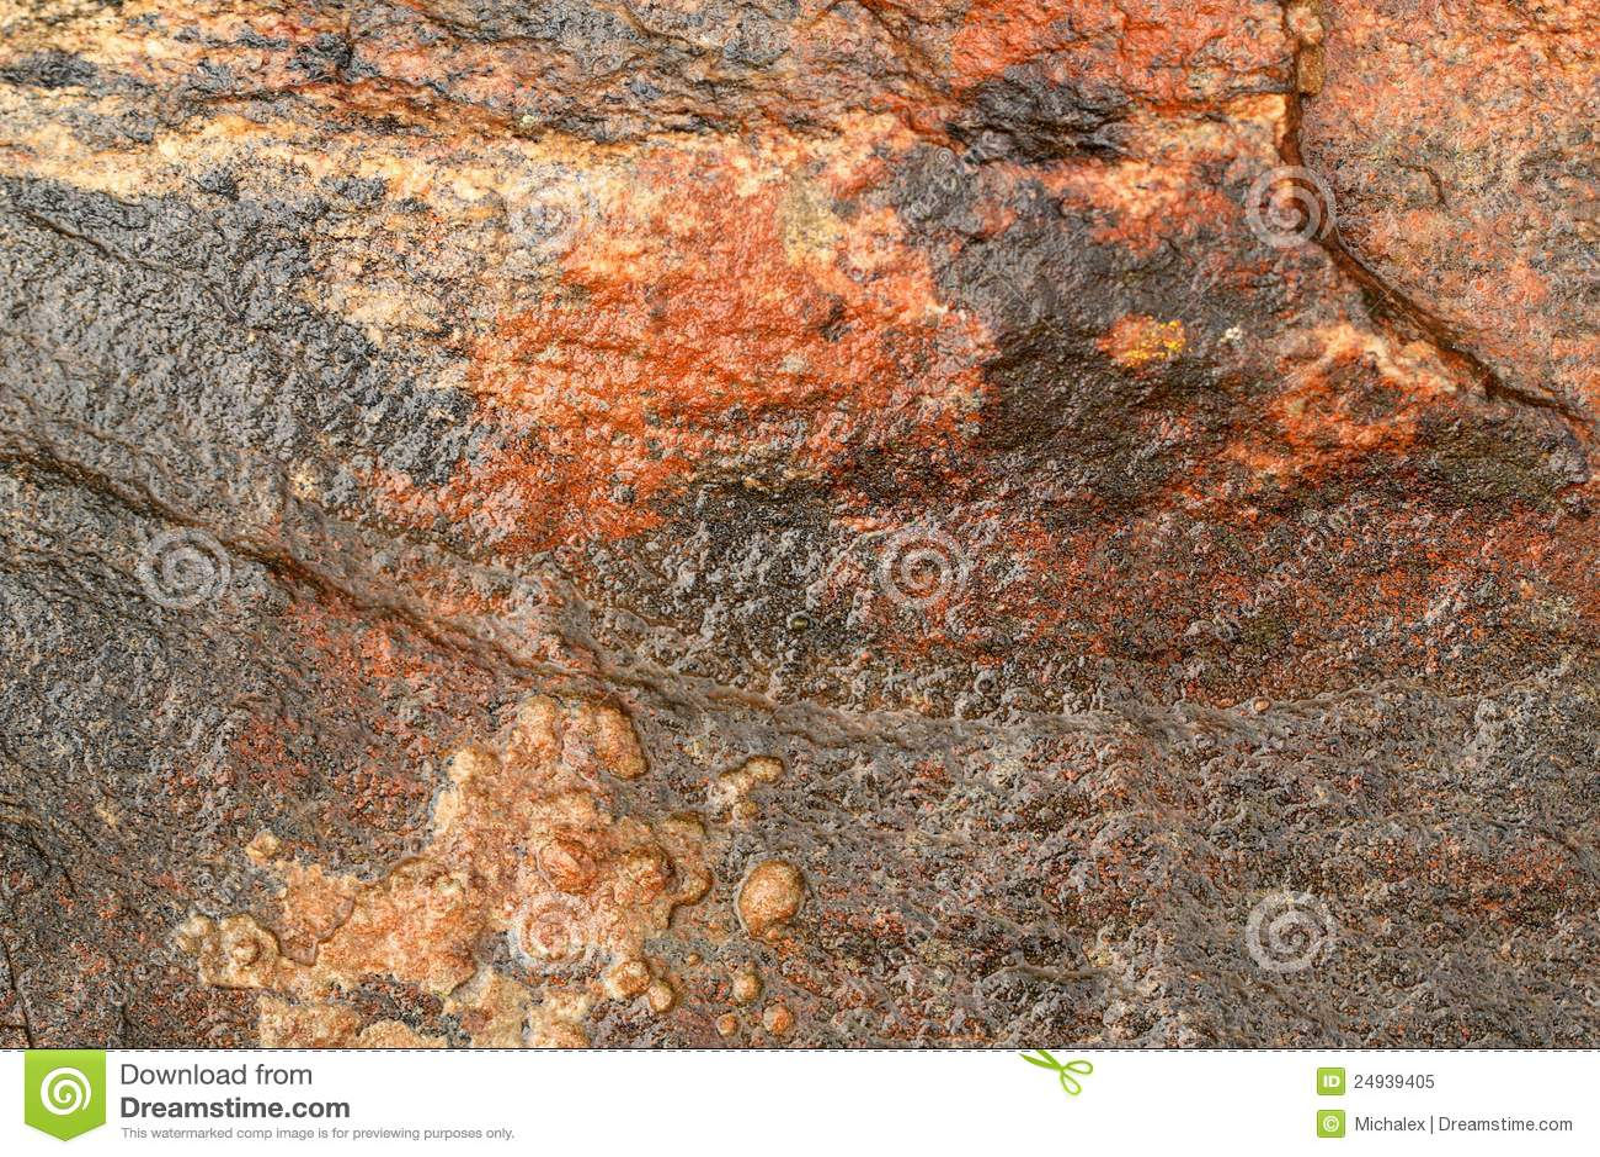 Granite Surface : Terracotta Granite Surface Royalty Free Stock Photo - Image: 24939405